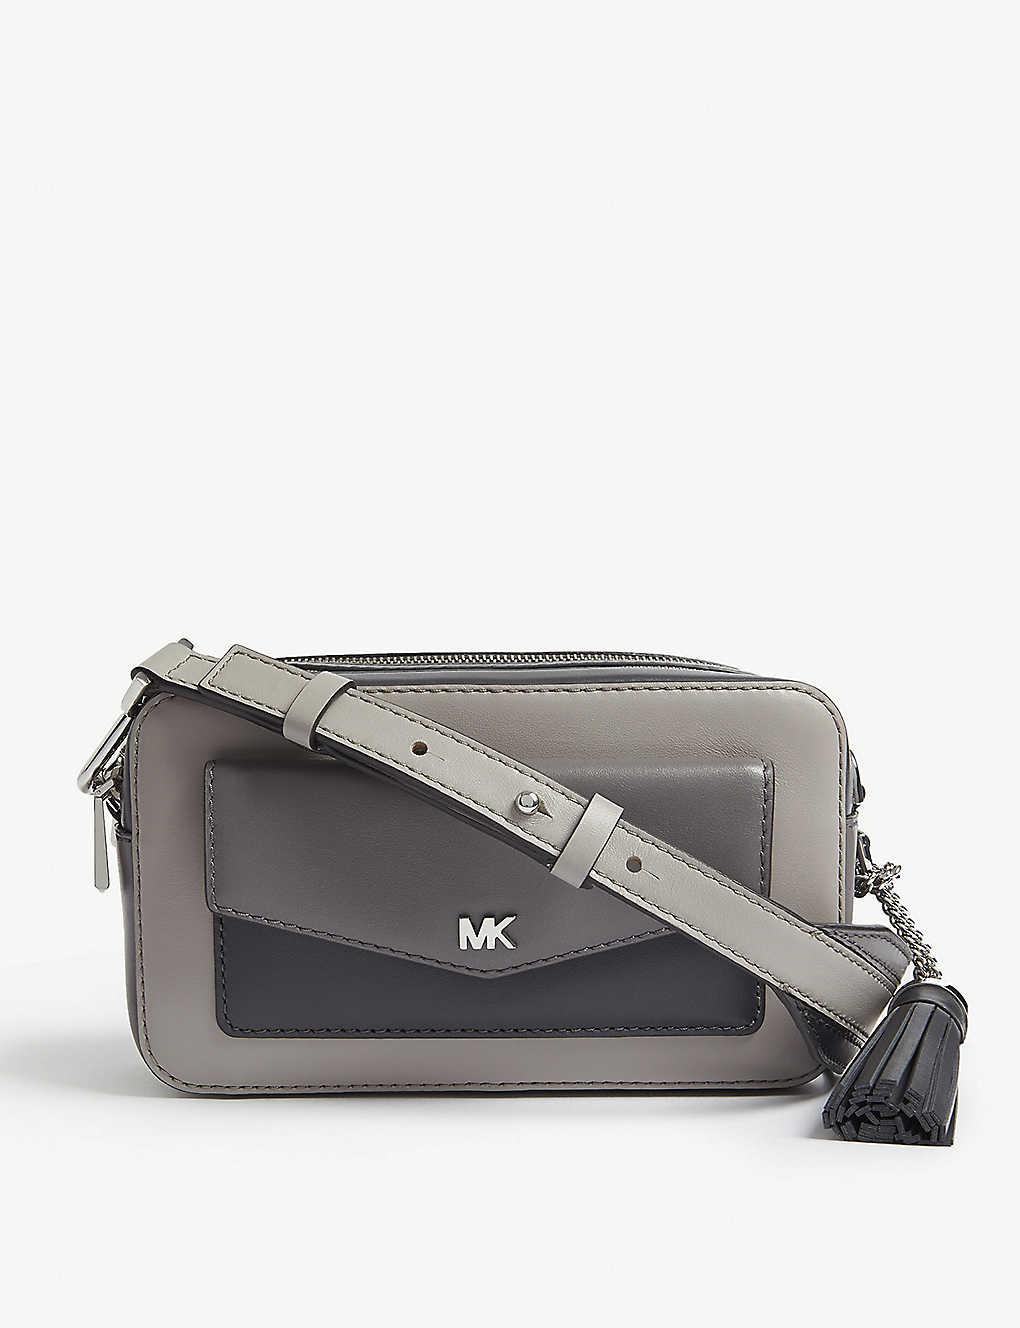 MICHAEL MICHAEL KORS - Leather small cross-body camera bag ... d41e3e5af1